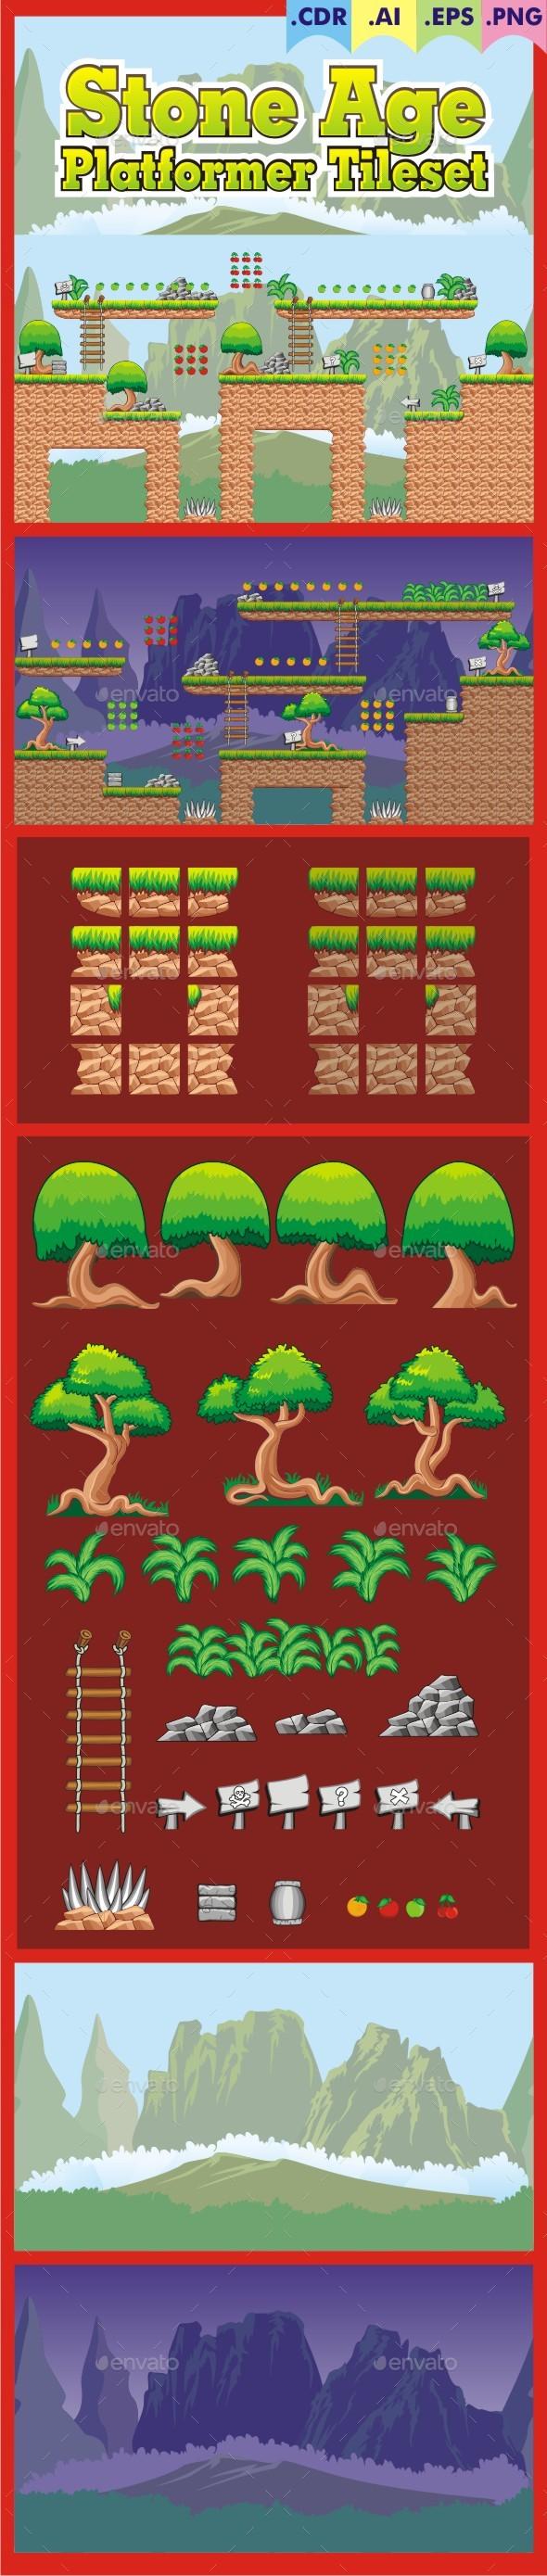 Stone Age - Platformer Tileset - Tilesets Game Assets